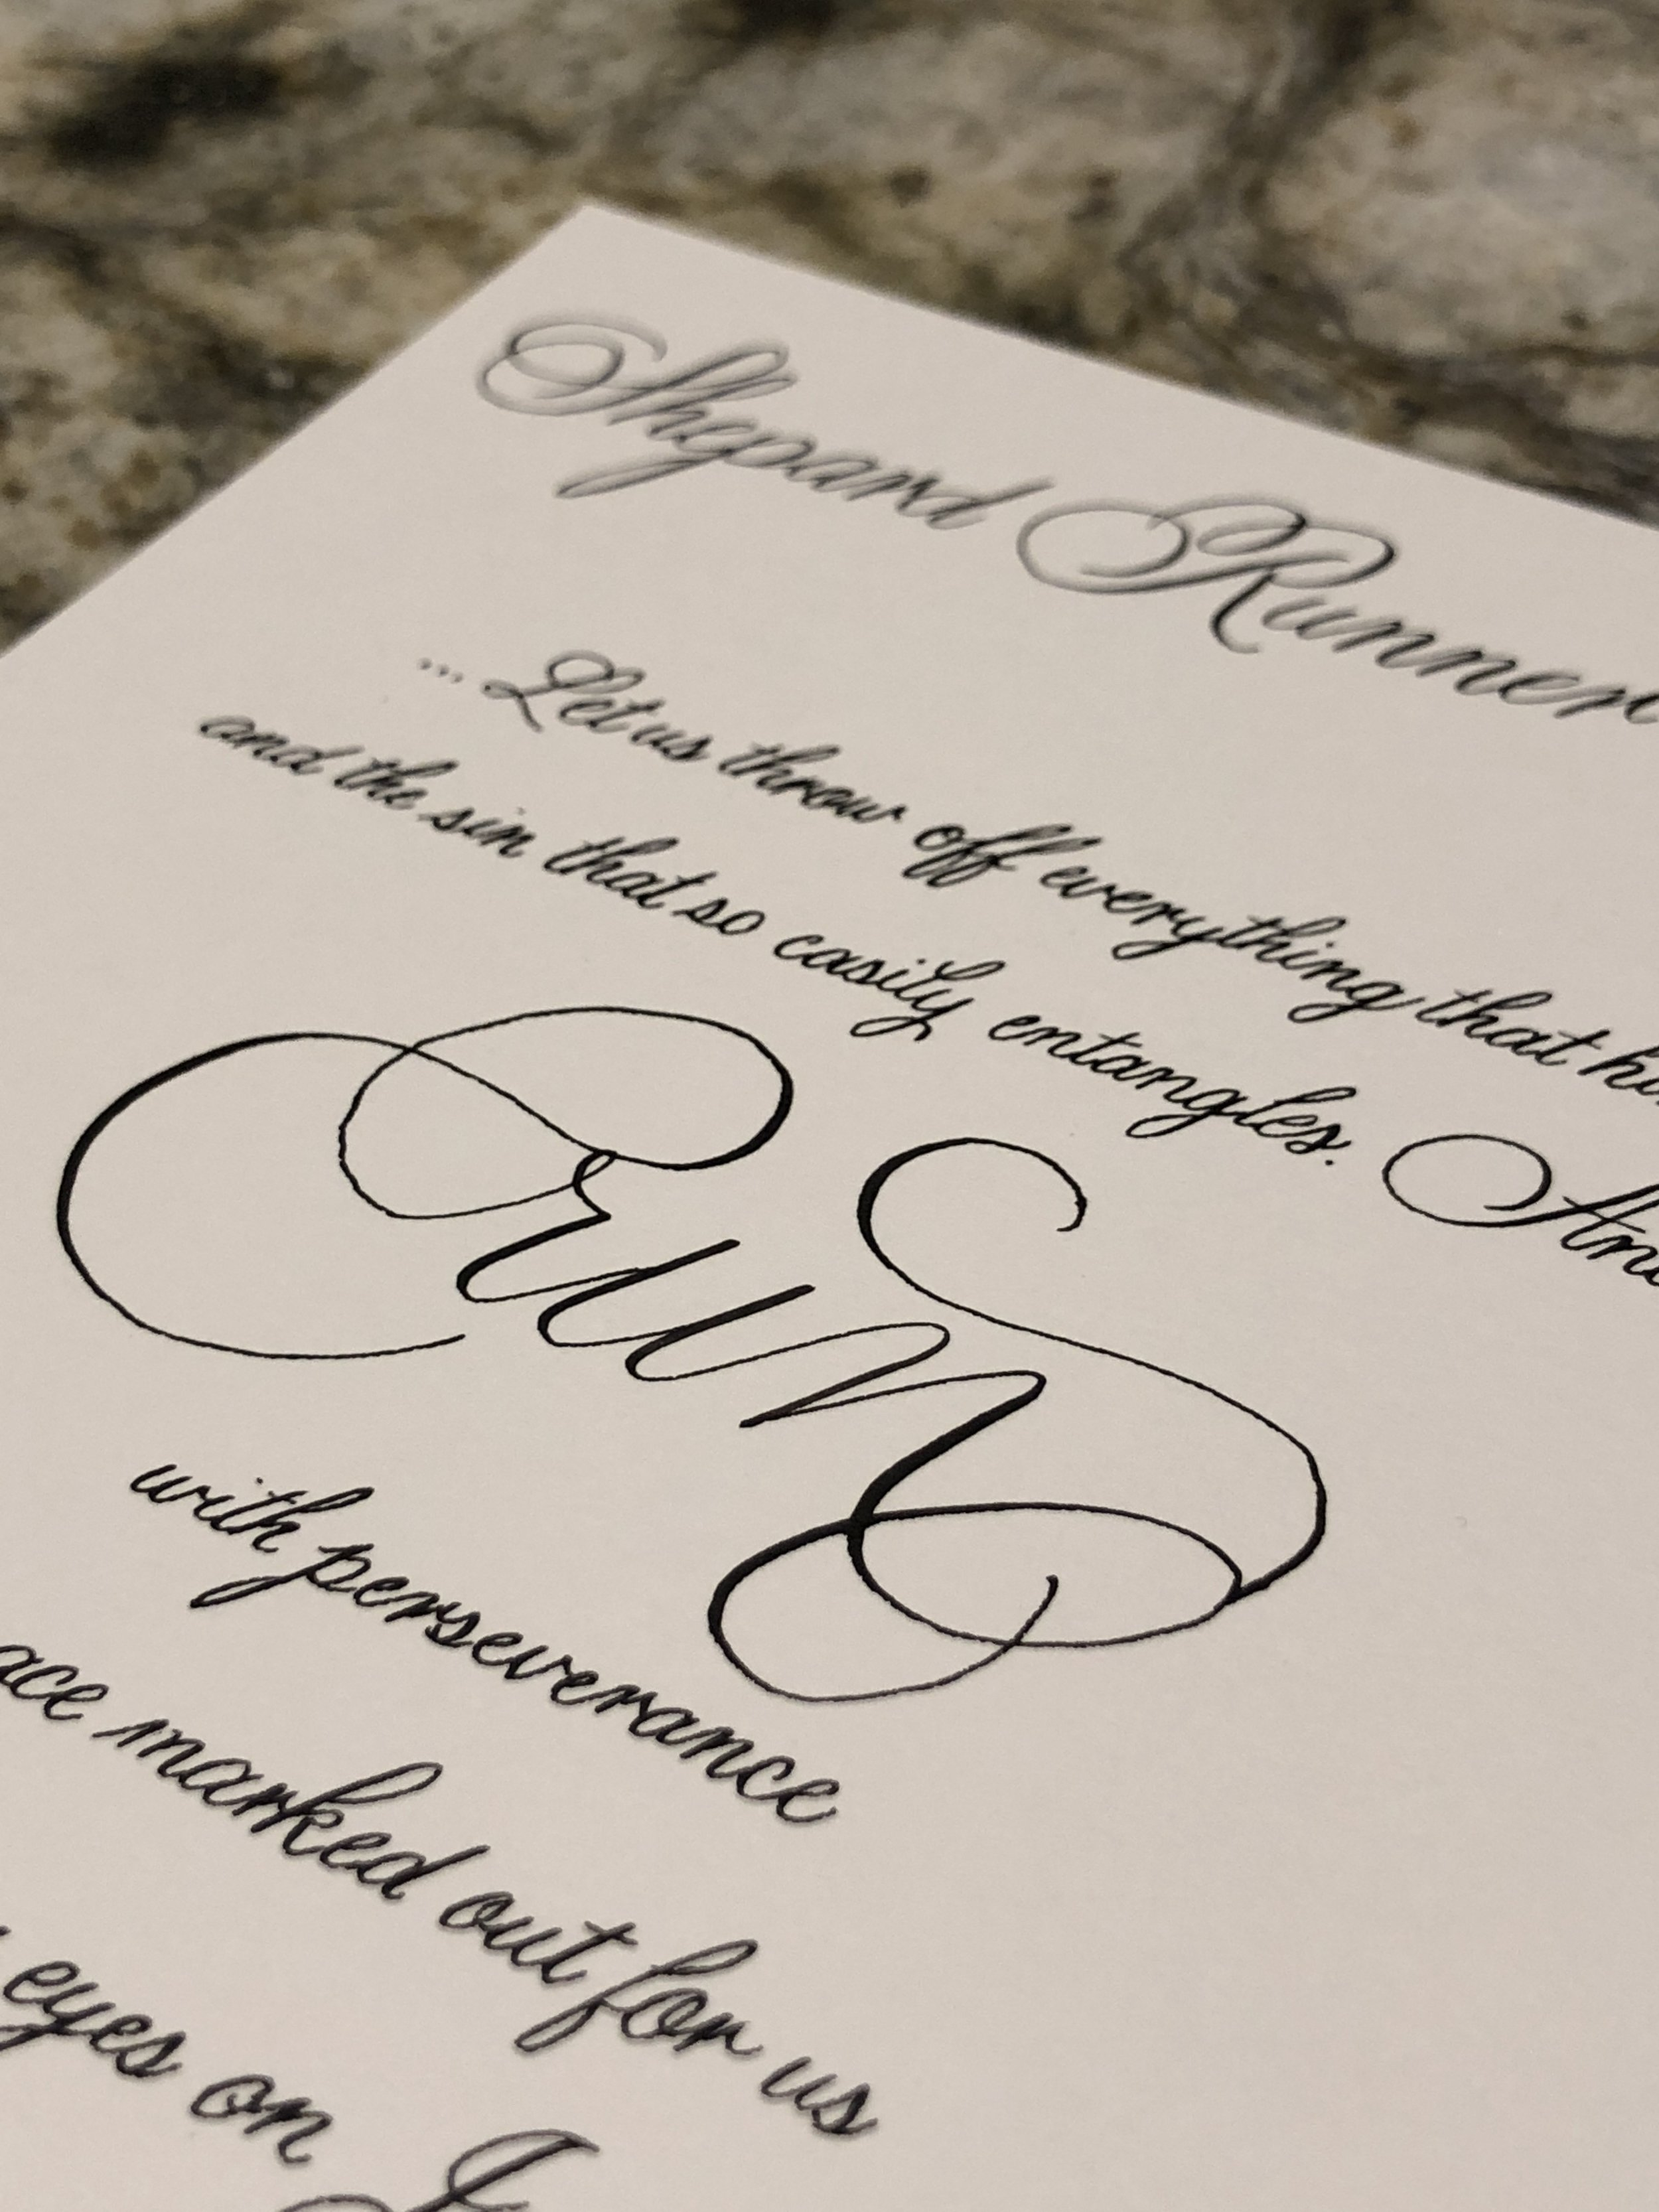 Central PA, York PA, JesSmith Designs, custom, wedding, invitations, bridal, Harrisburg, hanover, calligraphy, baltimore, wedding invitations, lancaster, gettysburg, 06-27 20.00.23.jpg